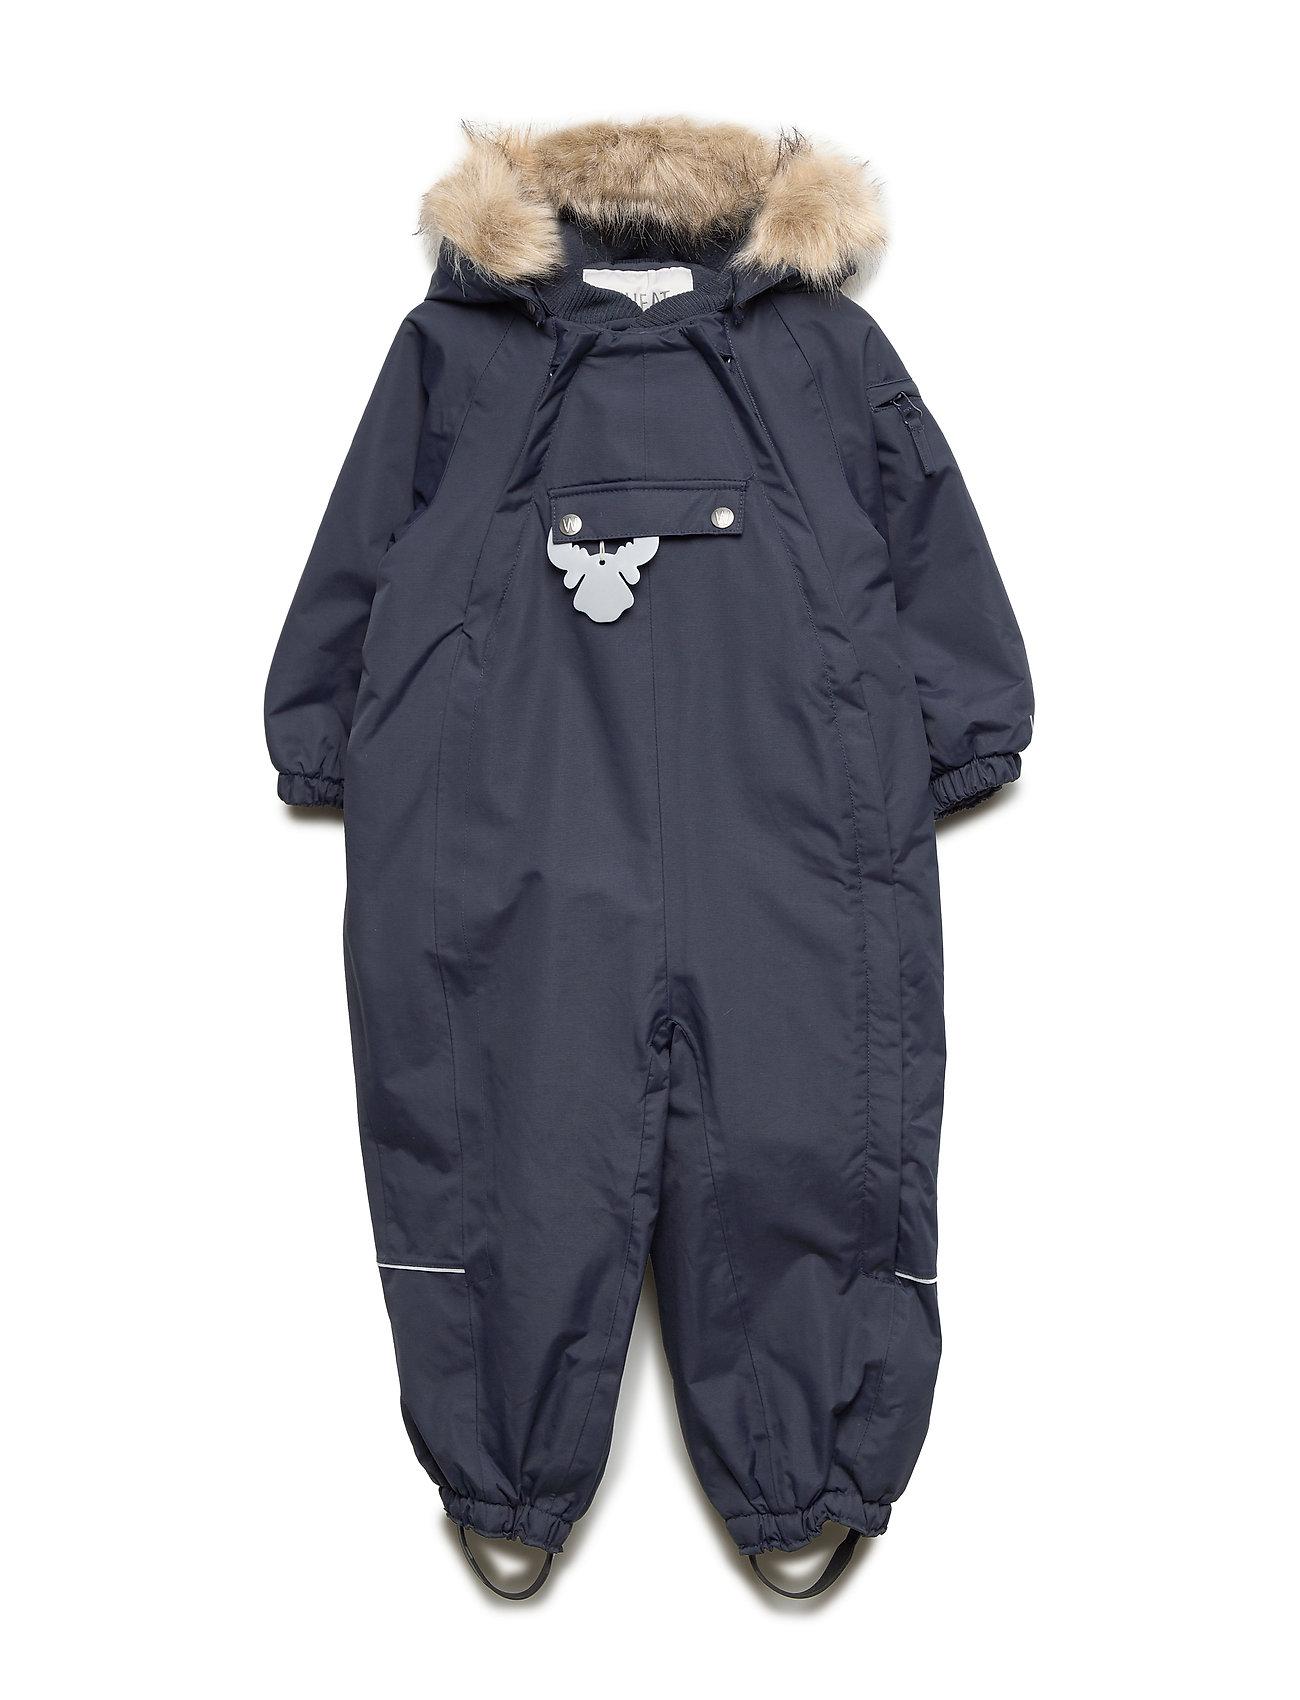 Wheat Snowsuit Nickie - NAVY